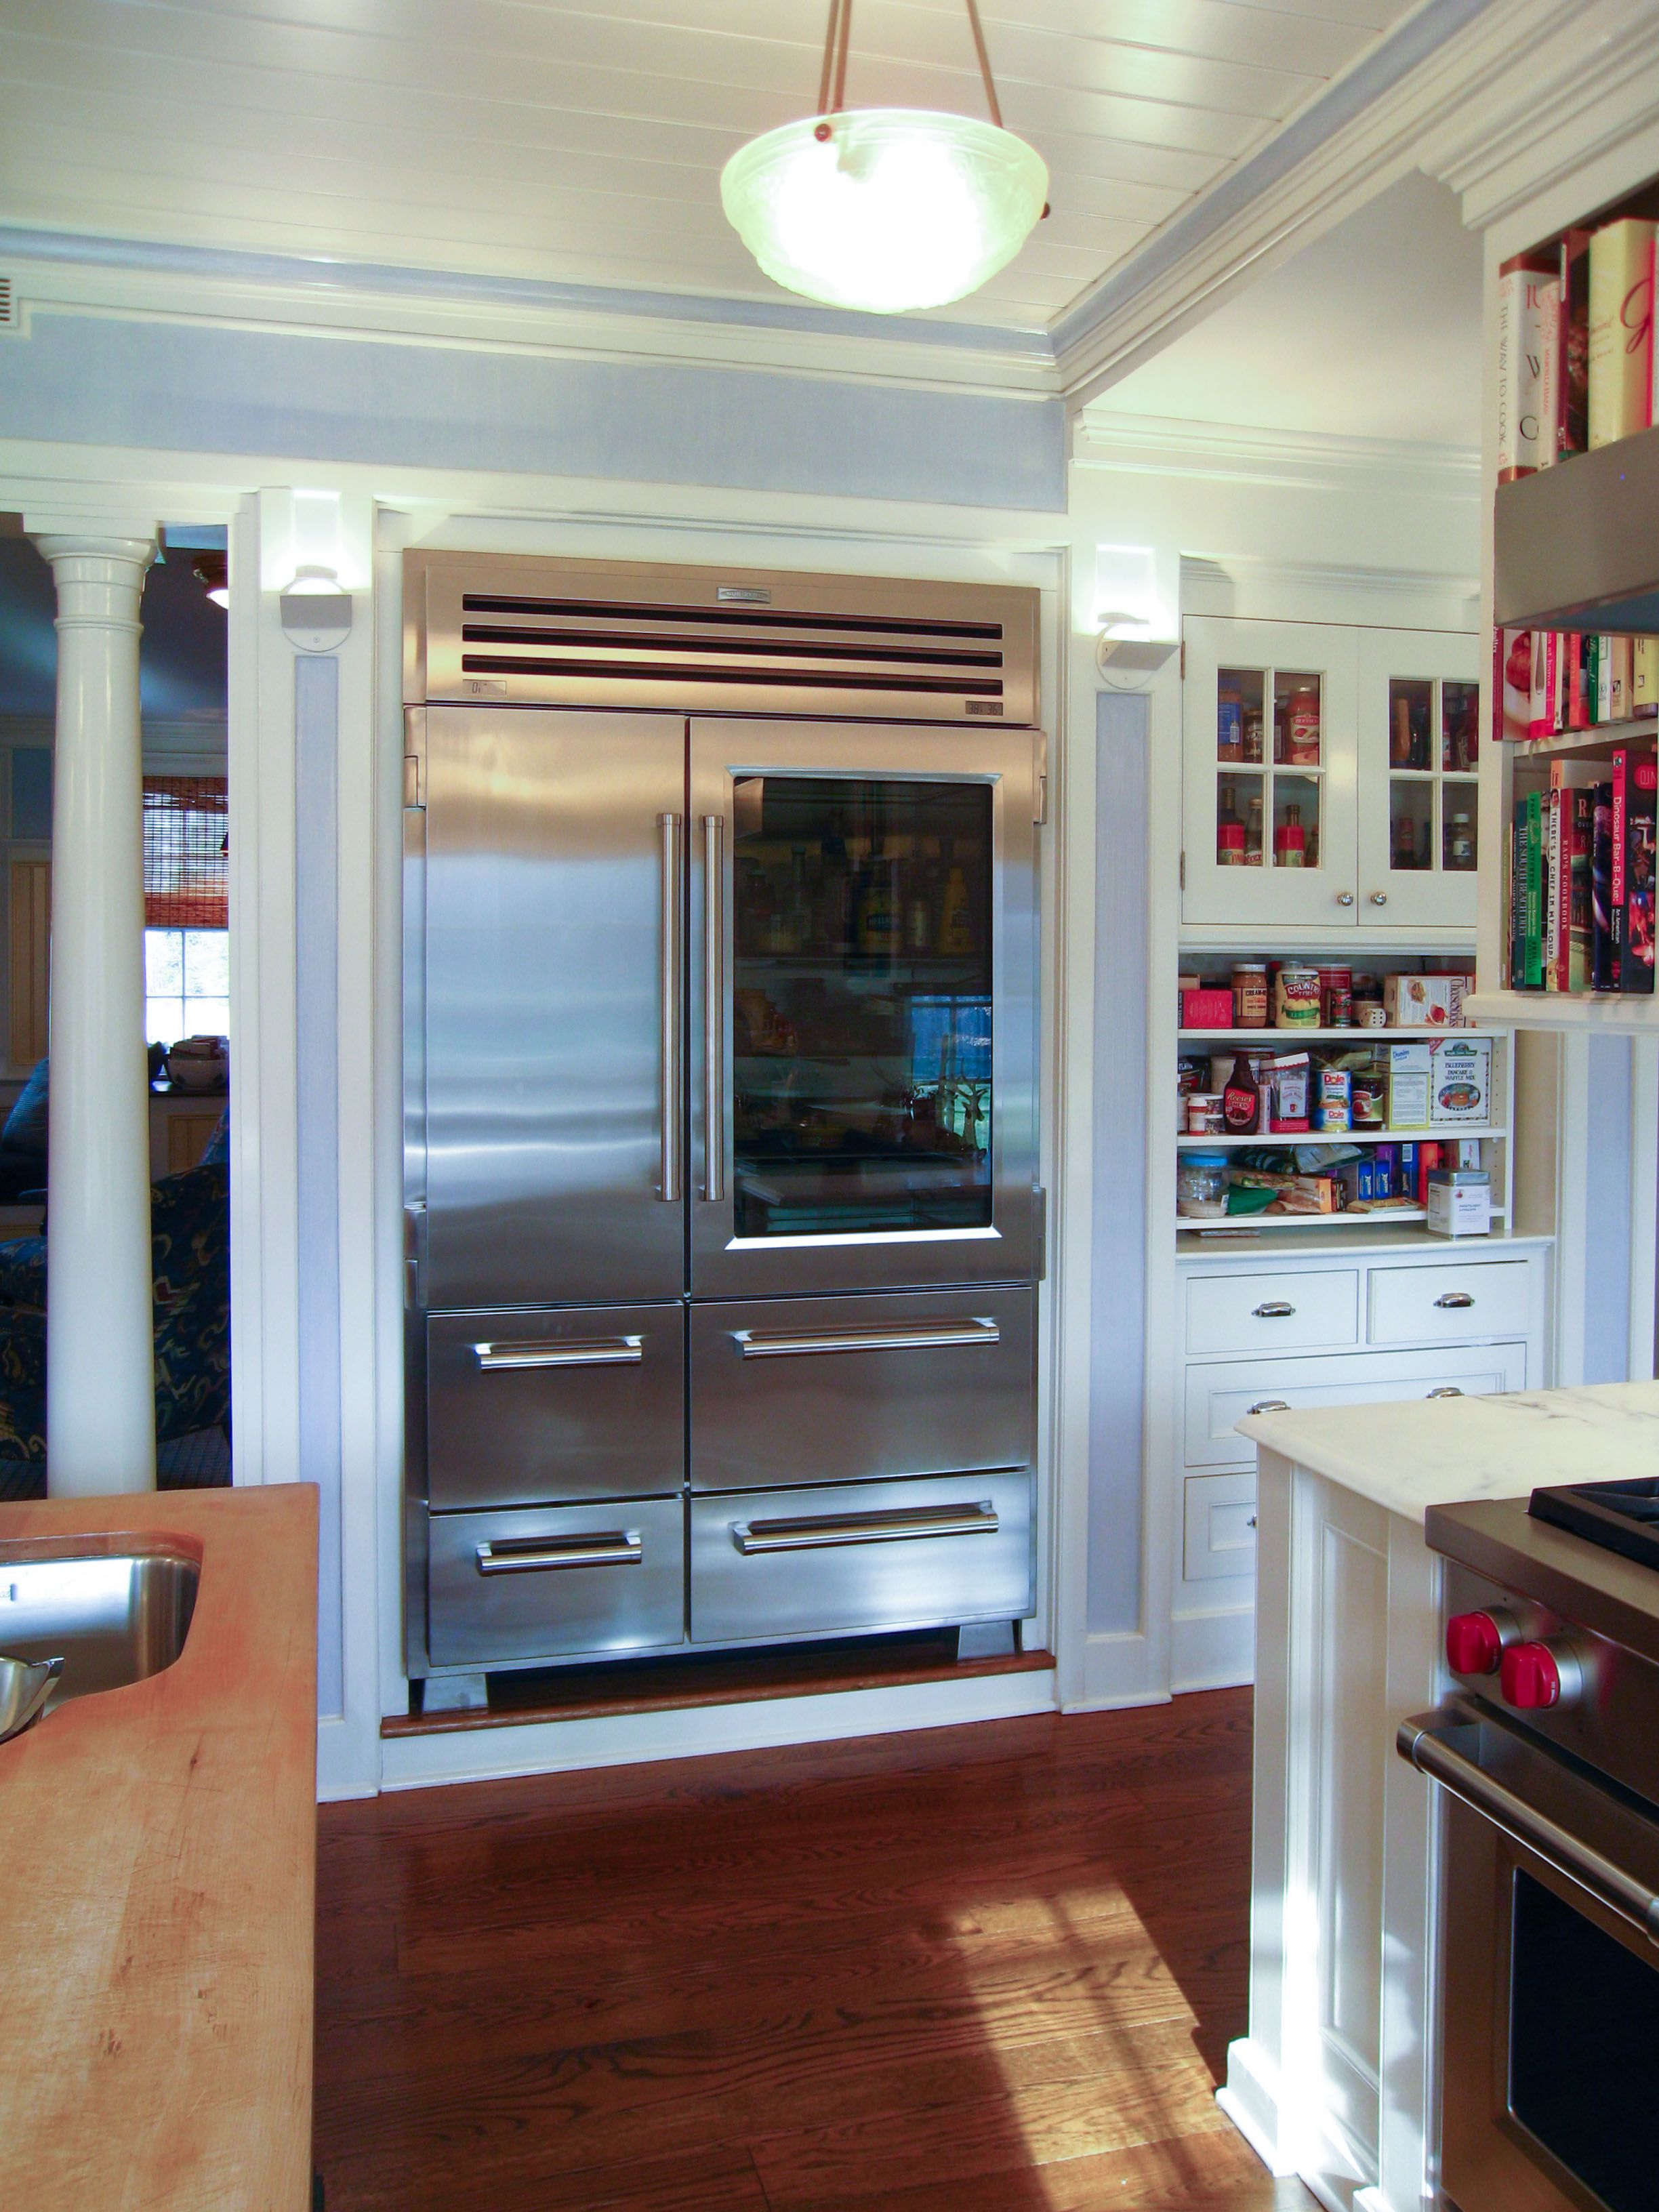 fresco of stylish design of glass door refrigerator residential